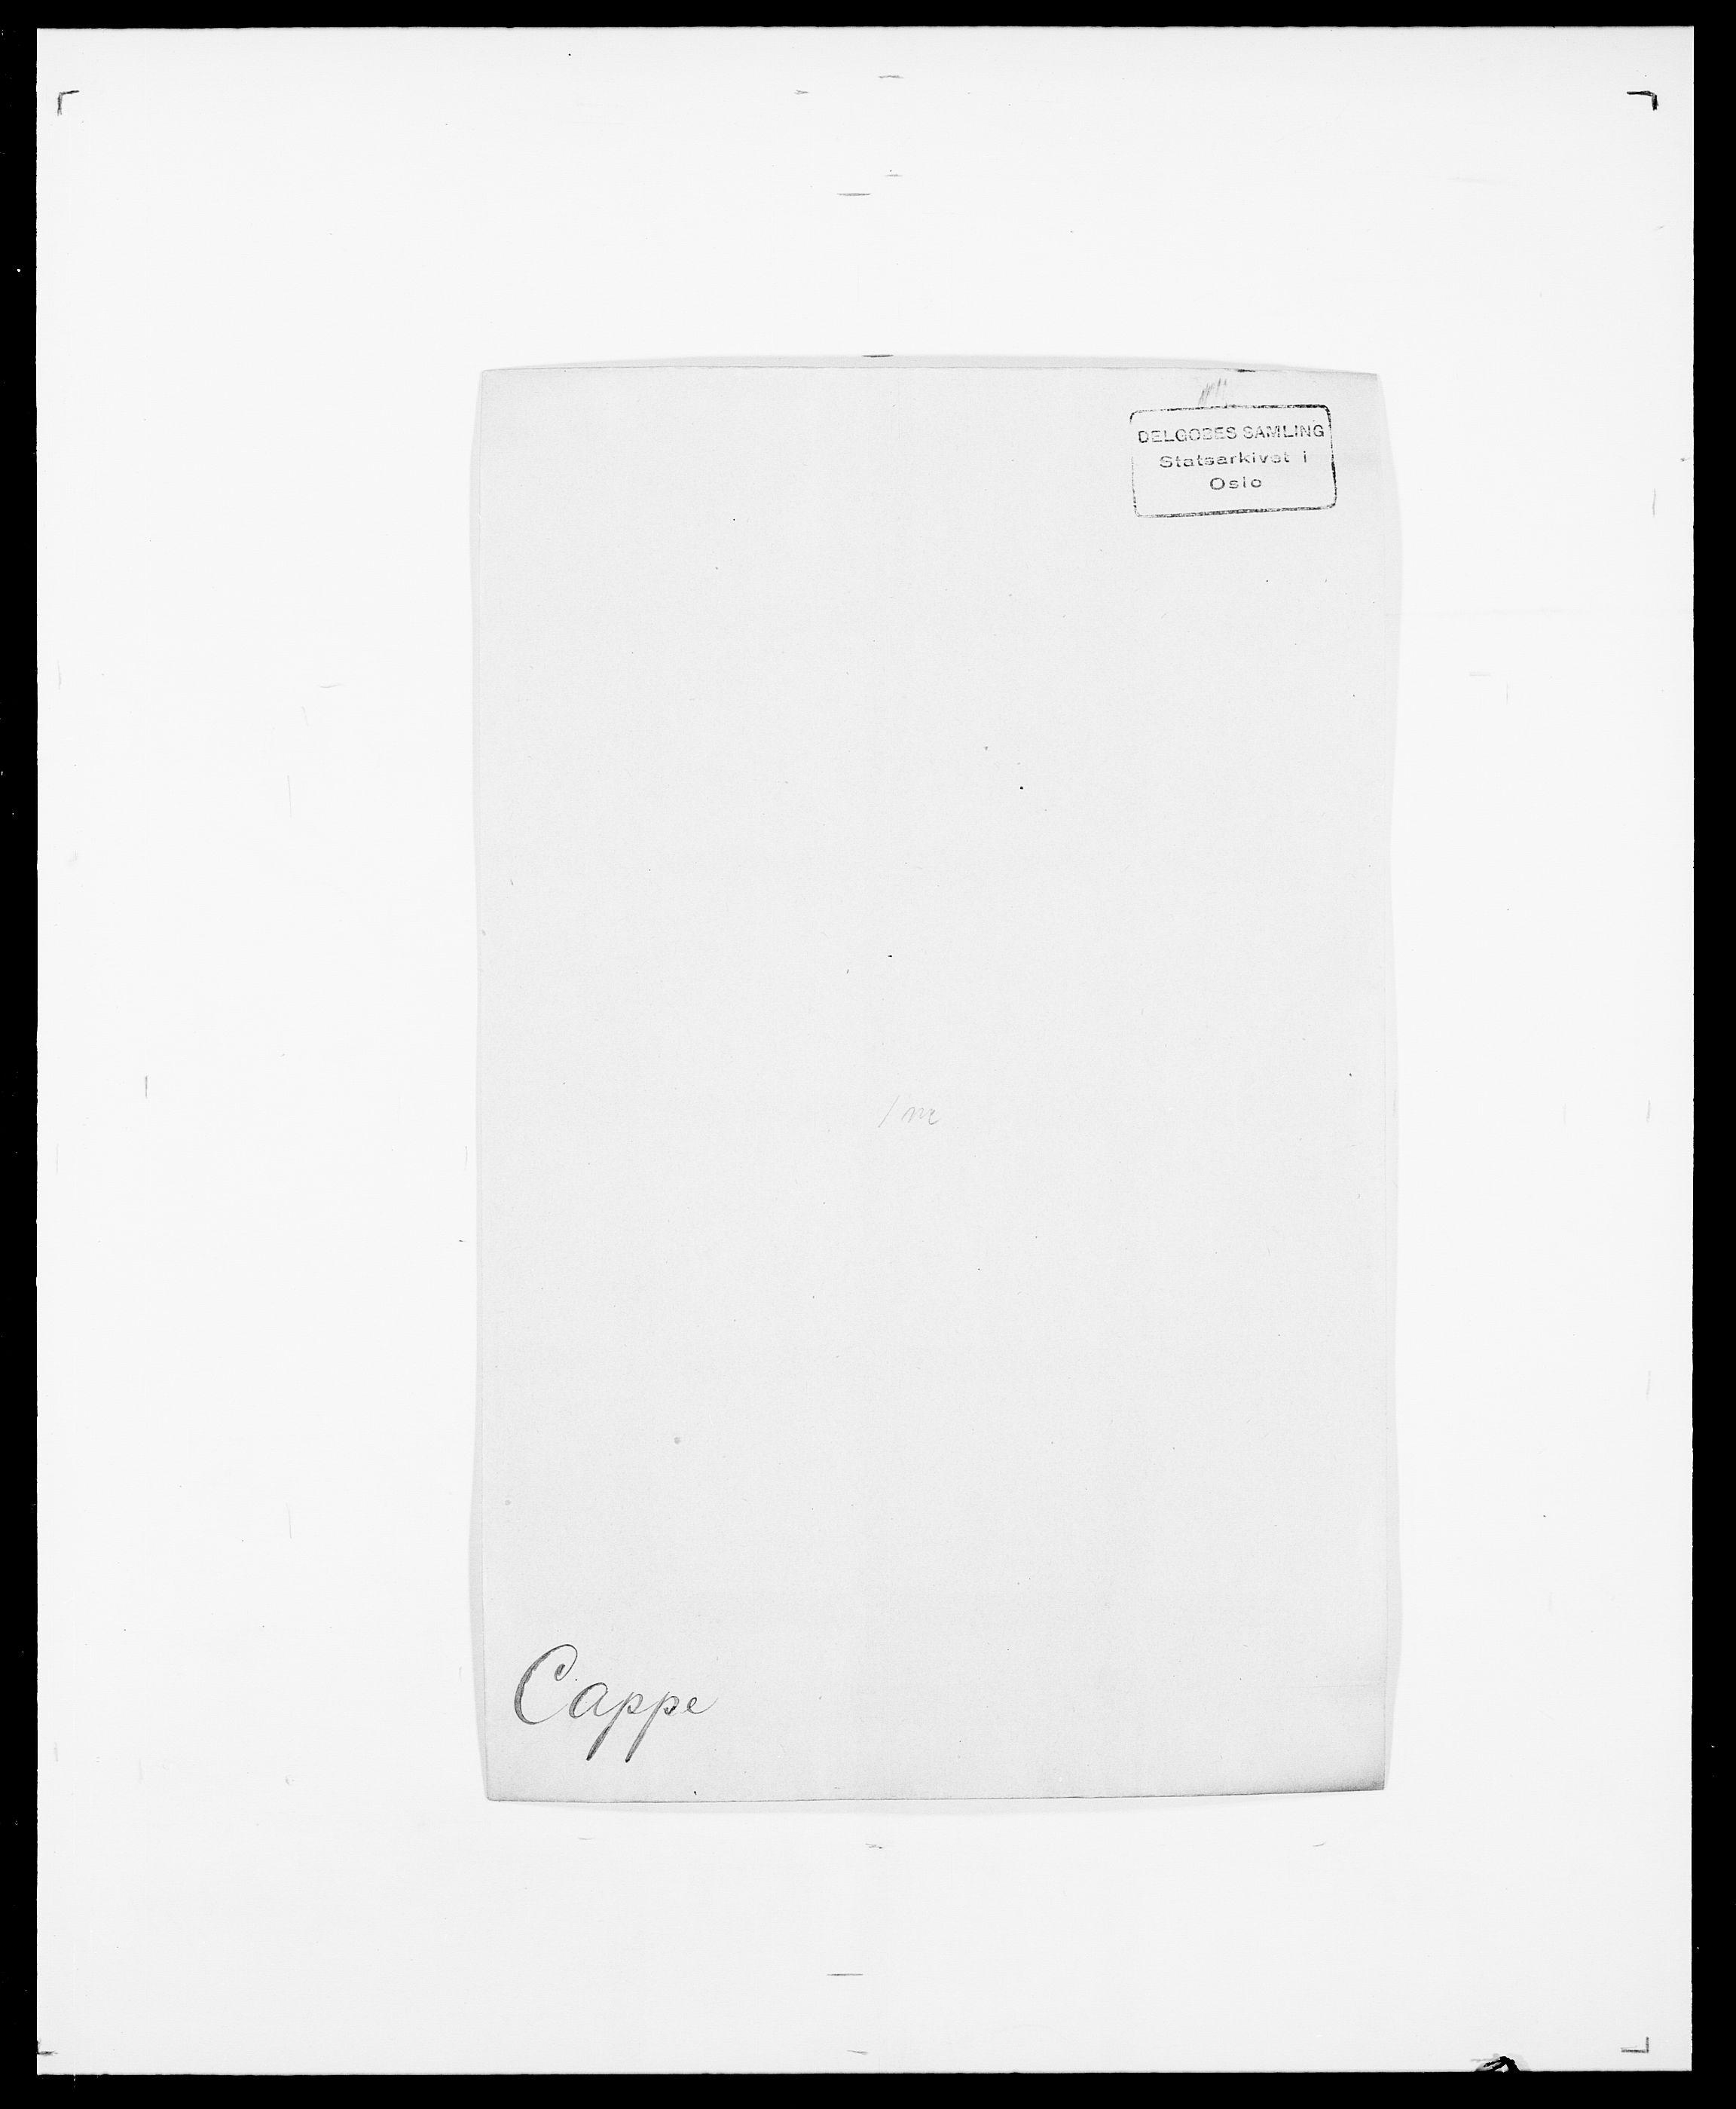 SAO, Delgobe, Charles Antoine - samling, D/Da/L0008: Capjon - Dagenbolt, s. 7